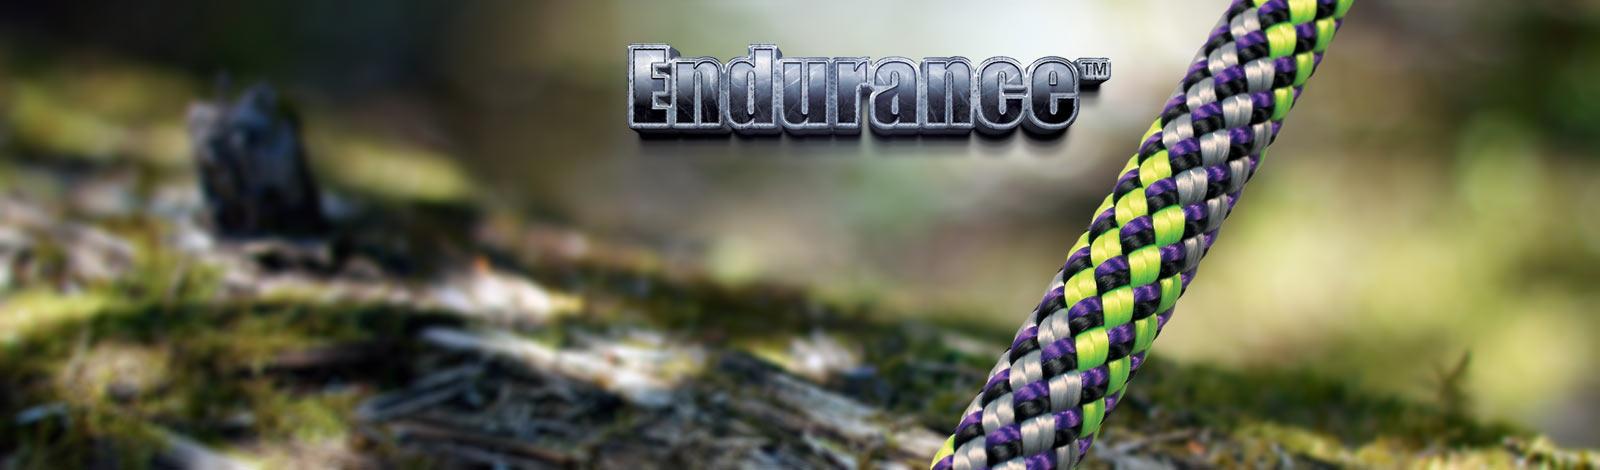 abl-endurance-sliderc